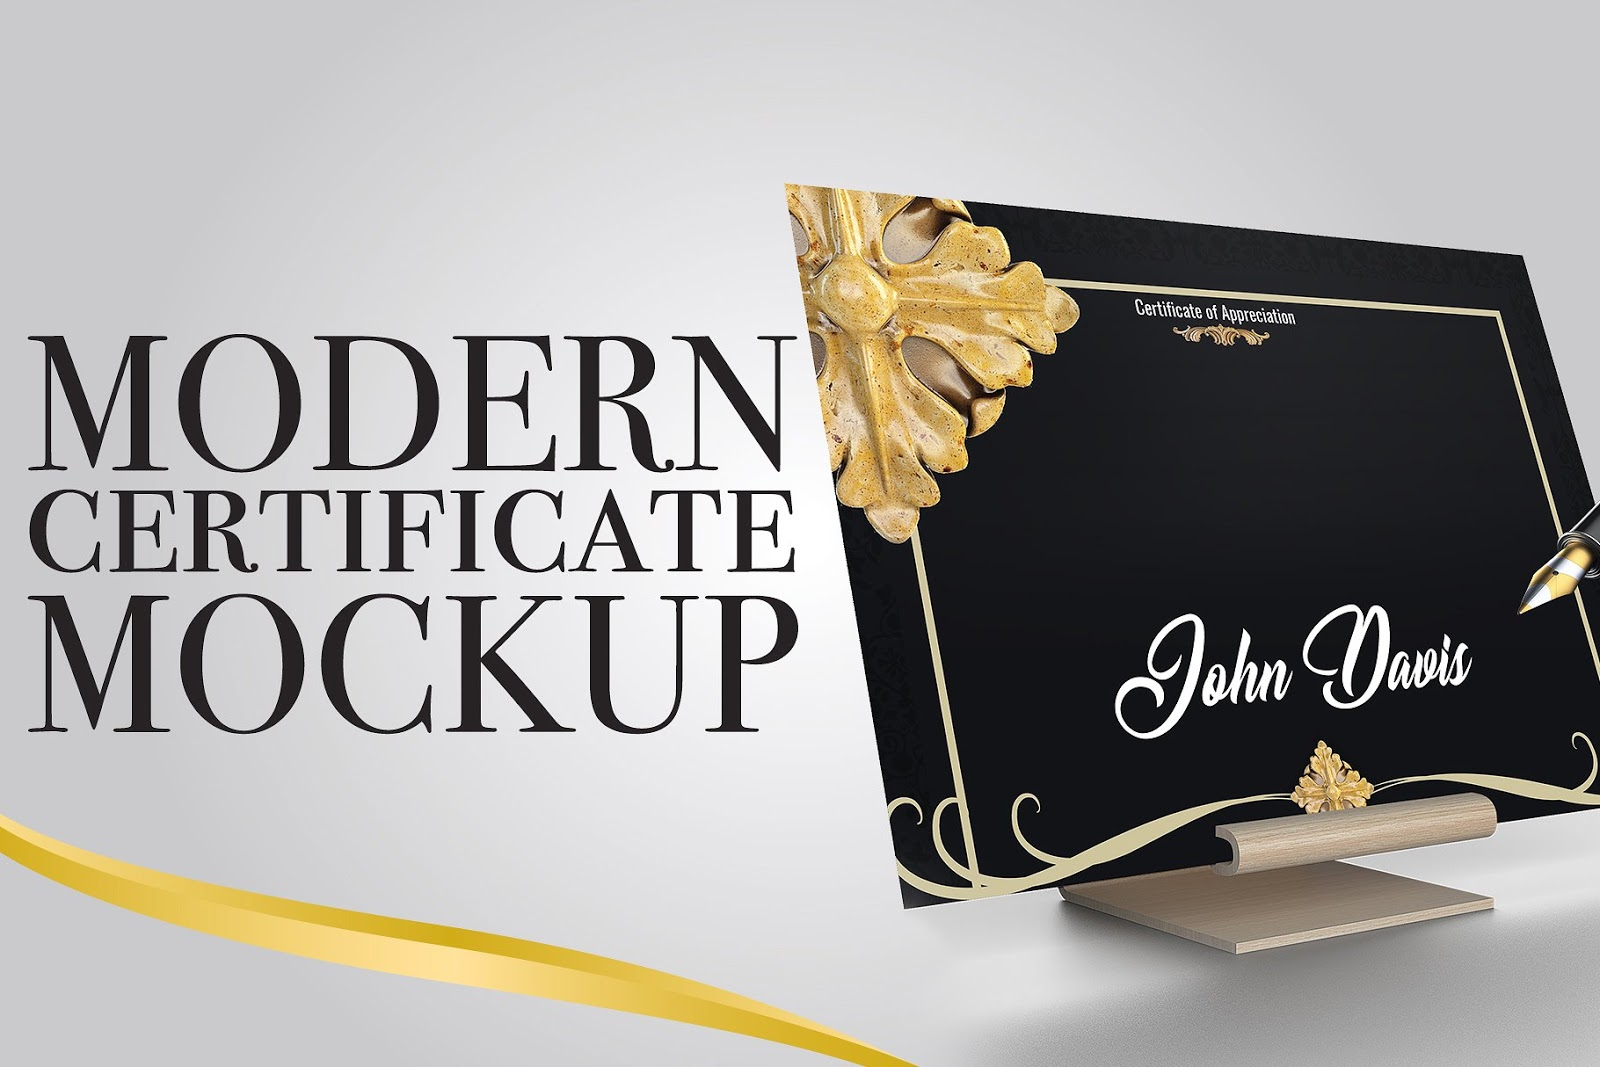 Modern Certificate Mockup